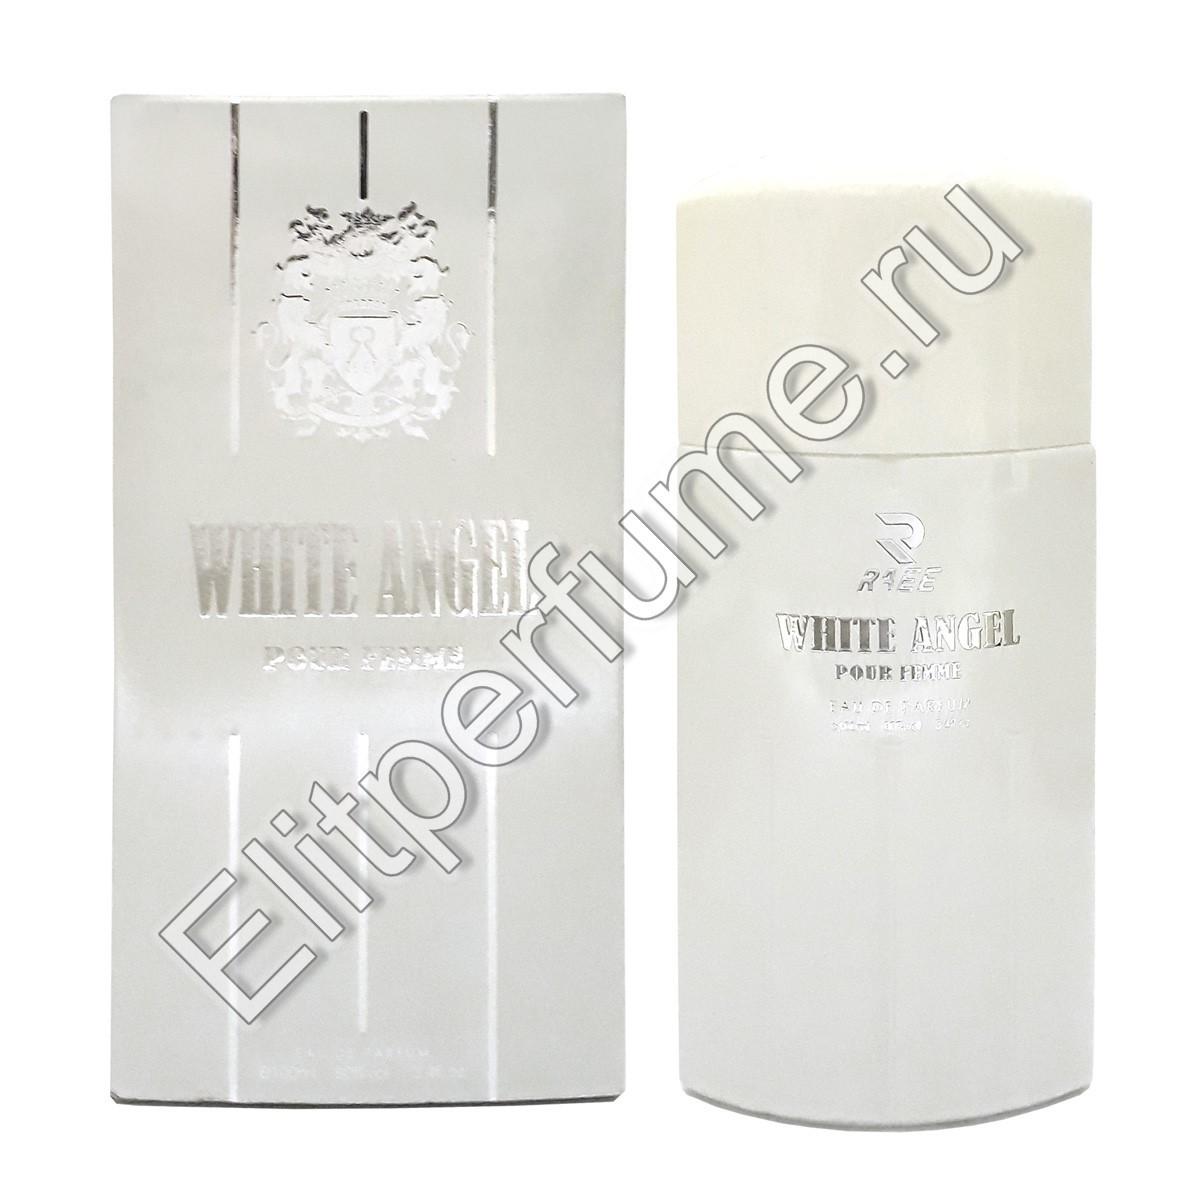 White Angel 100 мл спрей от Reev Khalis Perfumes Халис